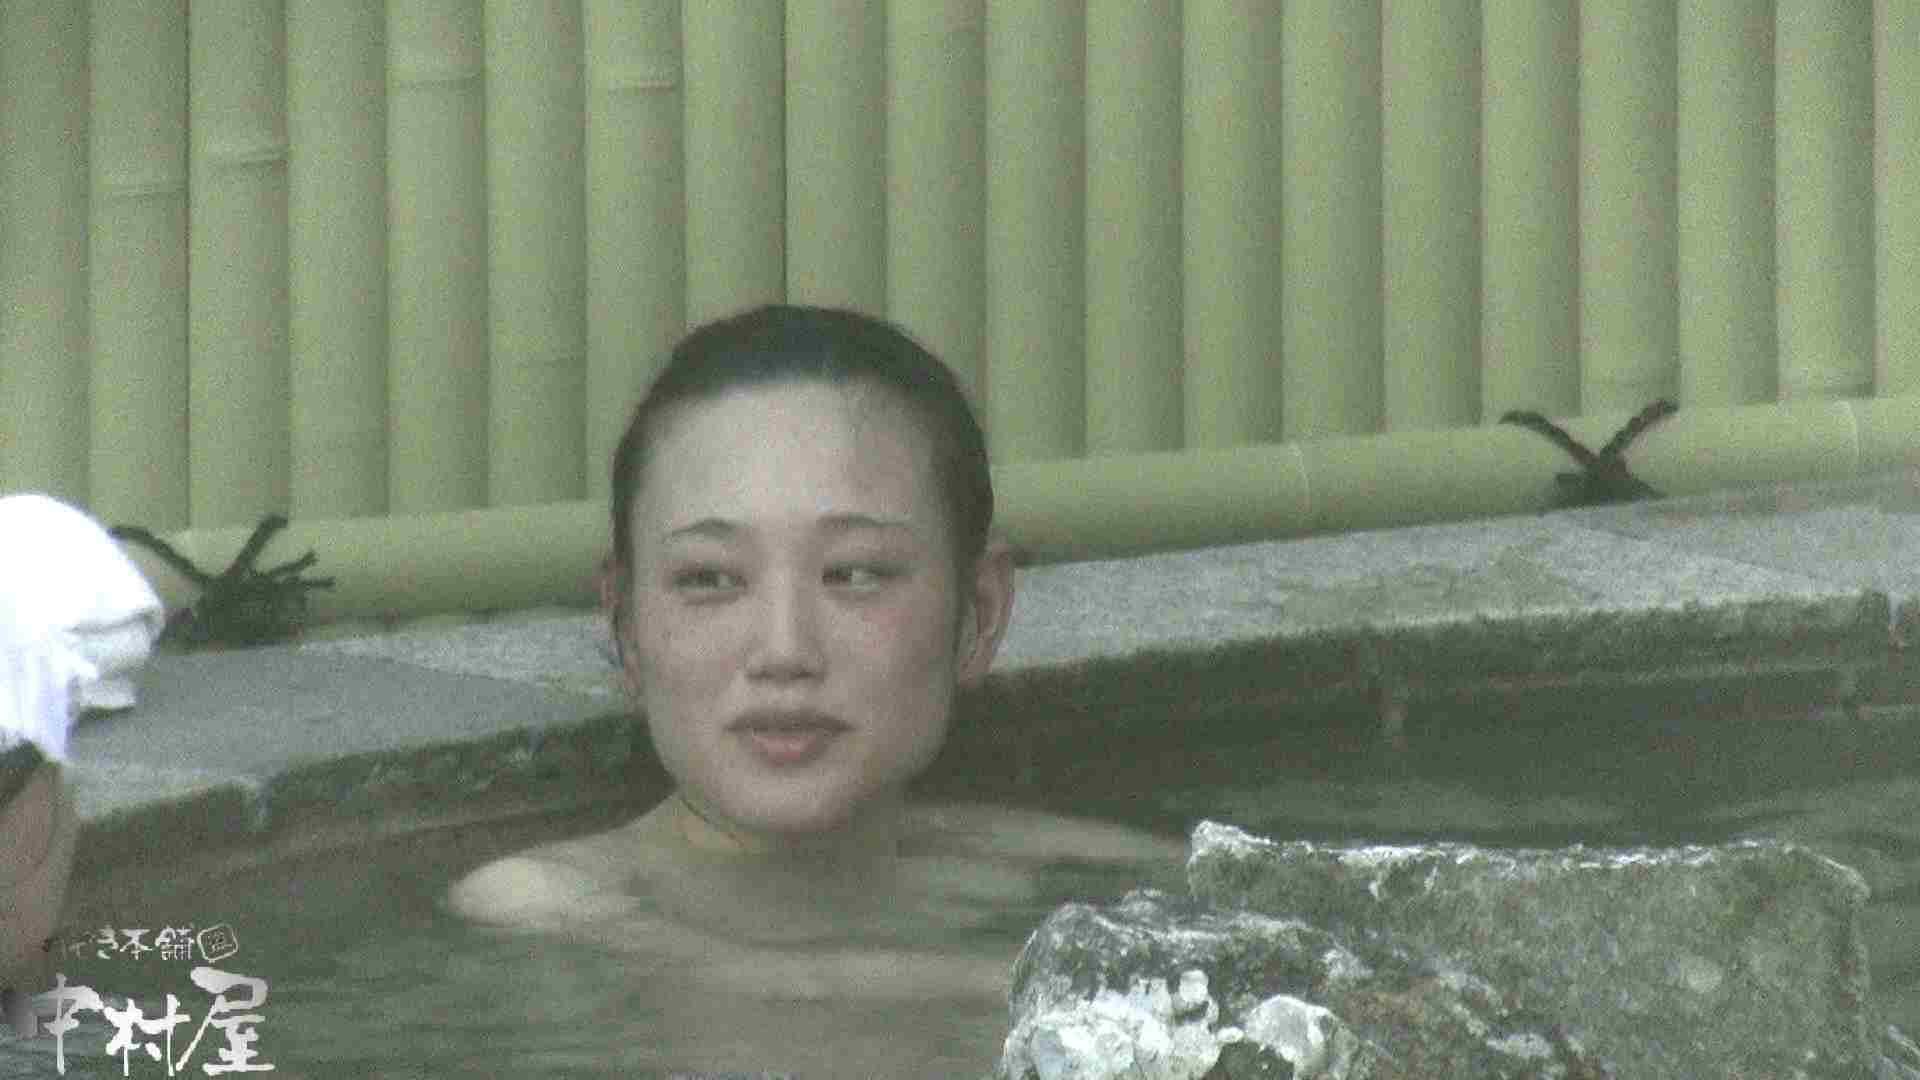 Aquaな露天風呂Vol.914 露天風呂編  83PIX 64